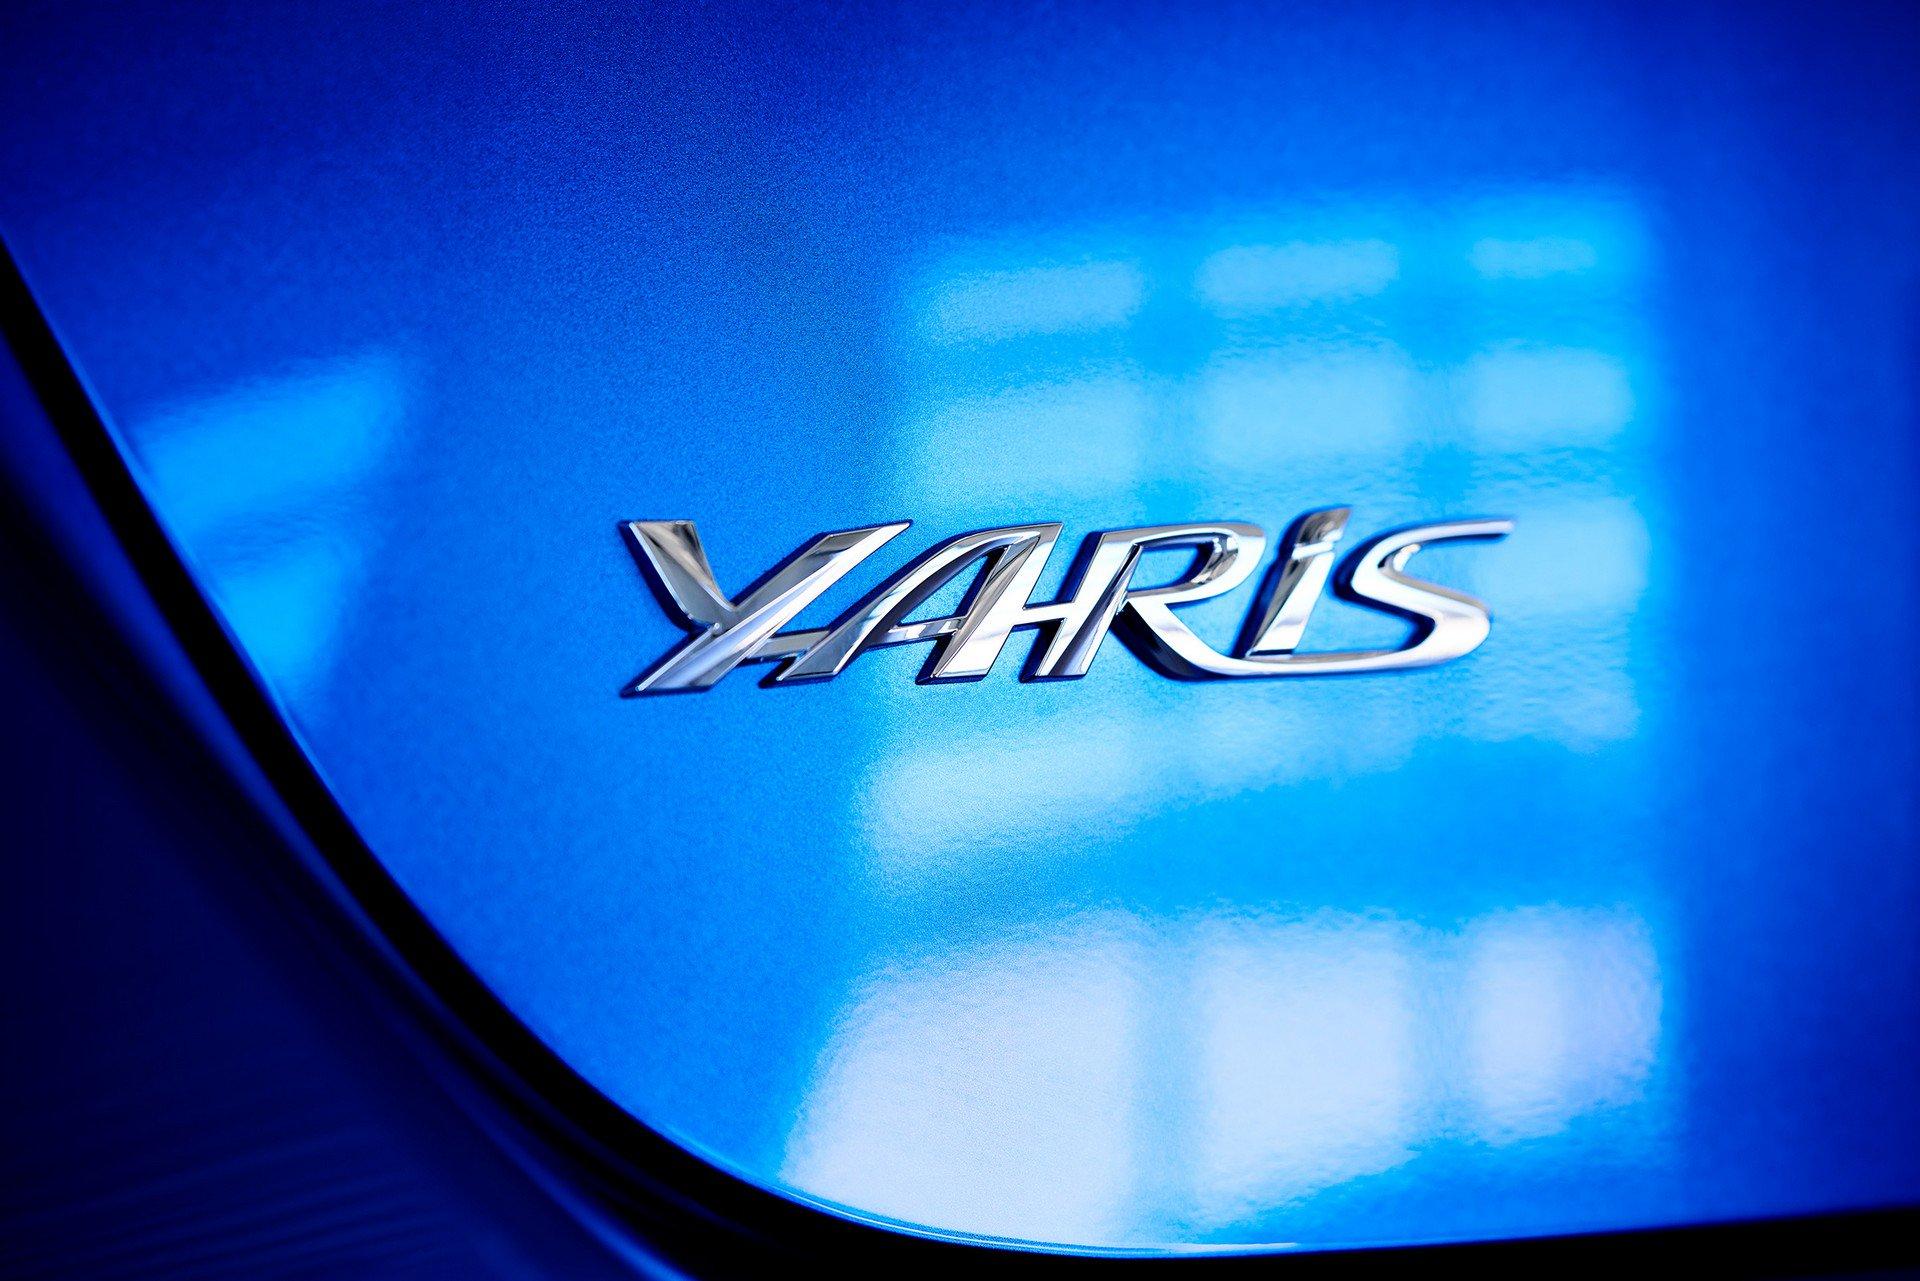 Toyota-Yaris-Hatchback-2020-6